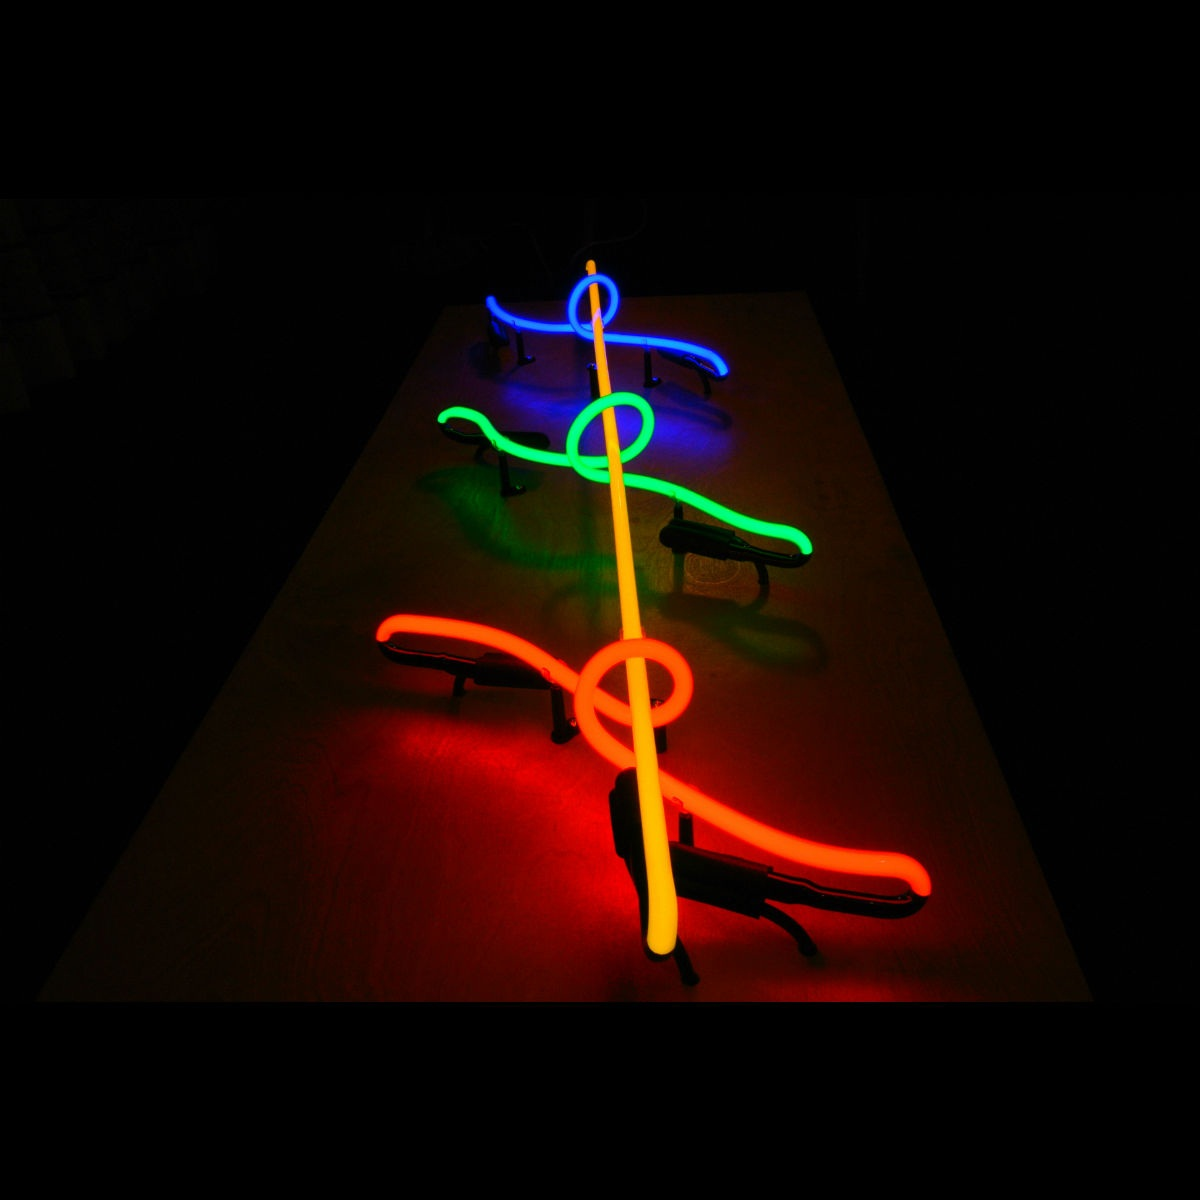 Magic Spiral stained Italian Glass Neon Art Sculpture by John Barton - BartonNeonMagic.com